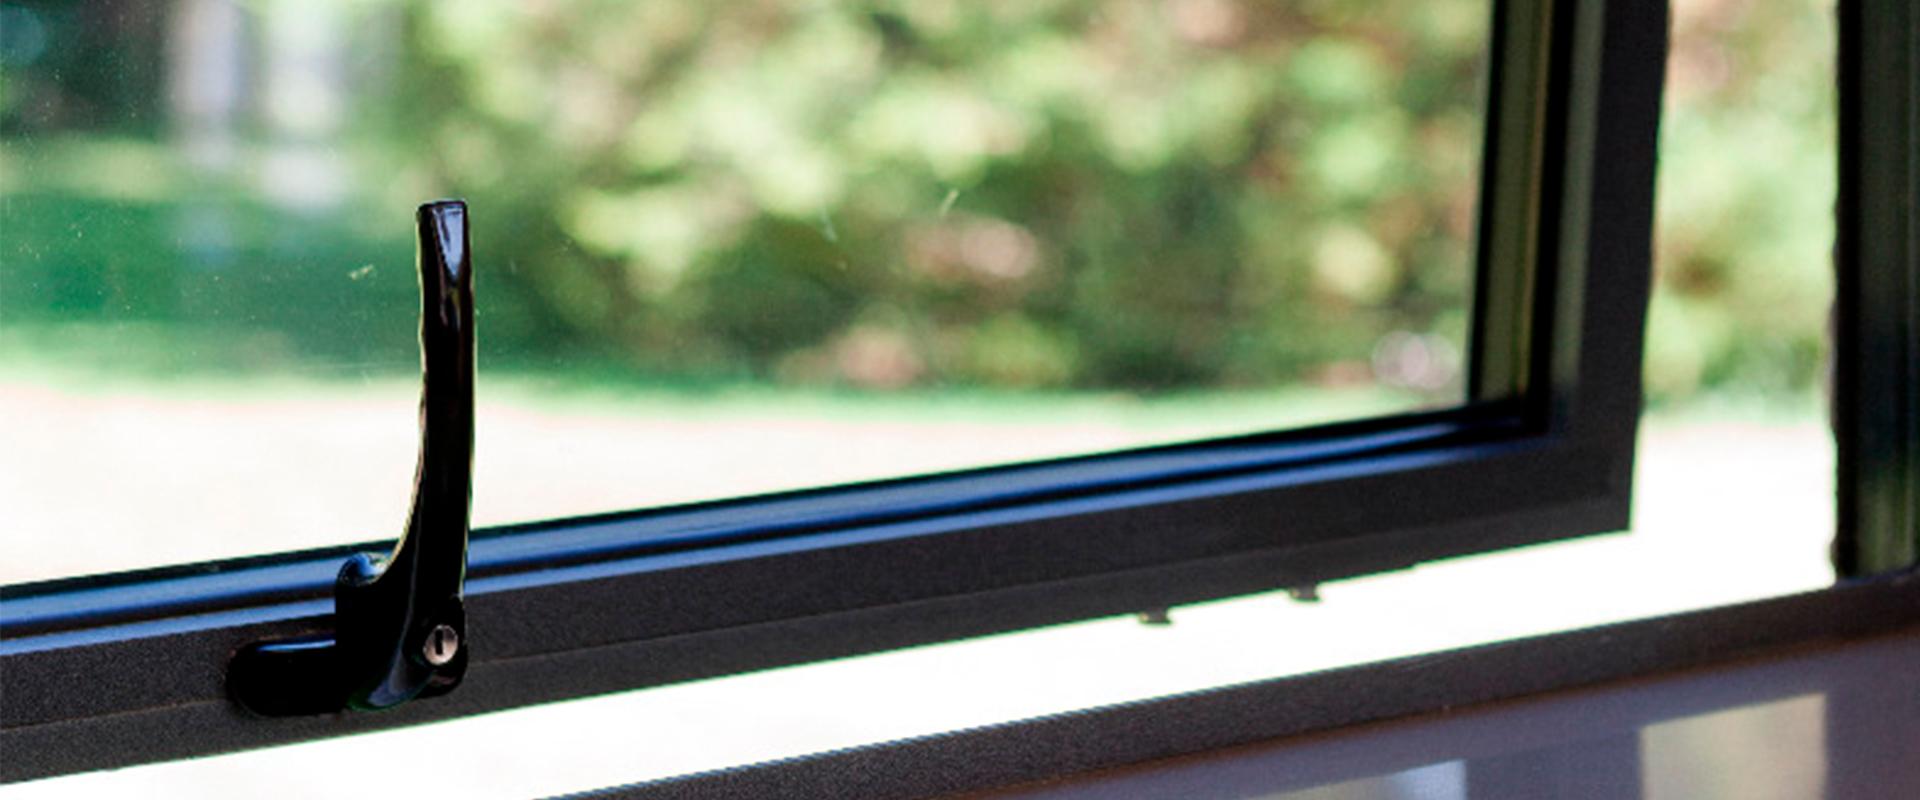 Crittall Windows Orpington